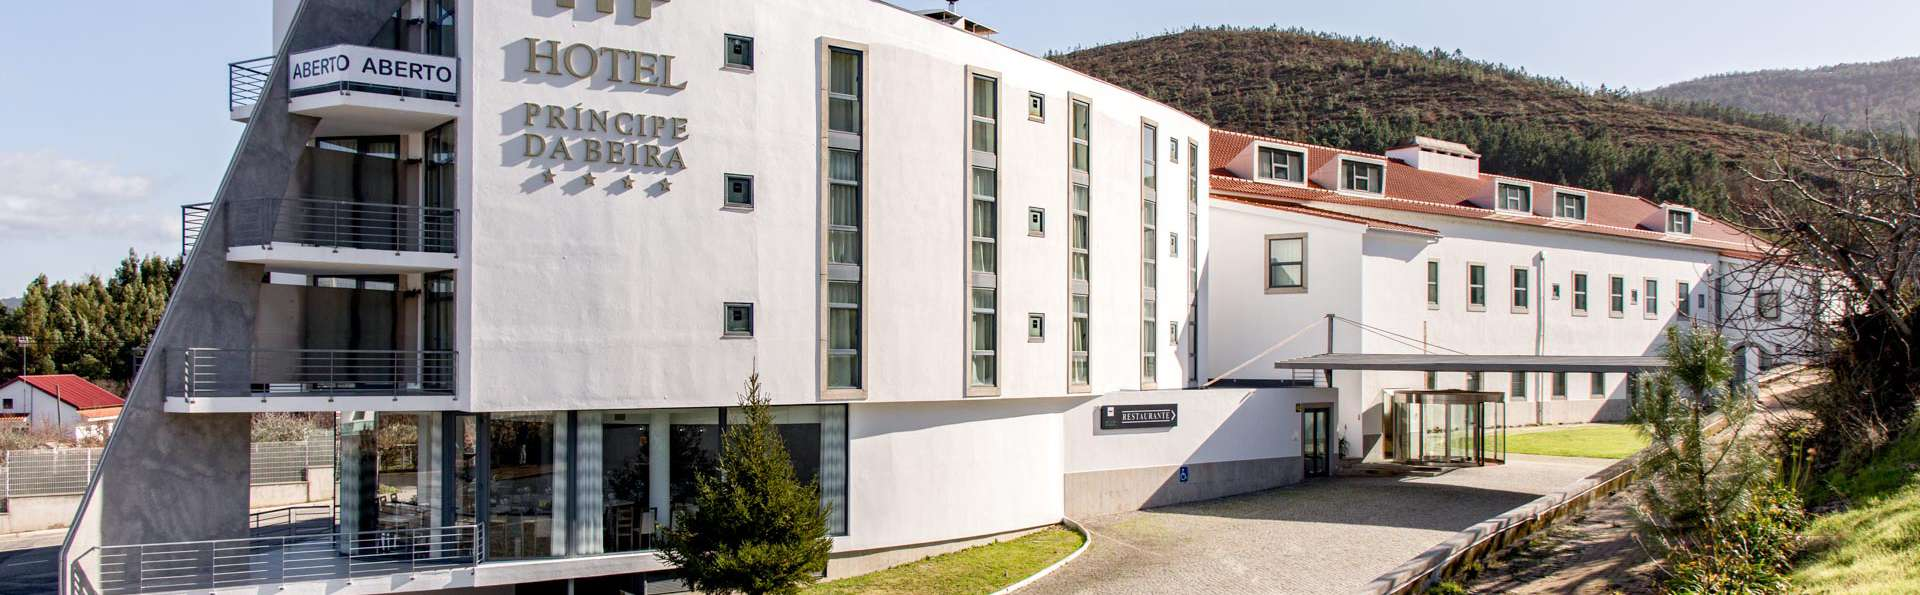 Hotel Principe da Beira - EDIT_FRONT_01.jpg